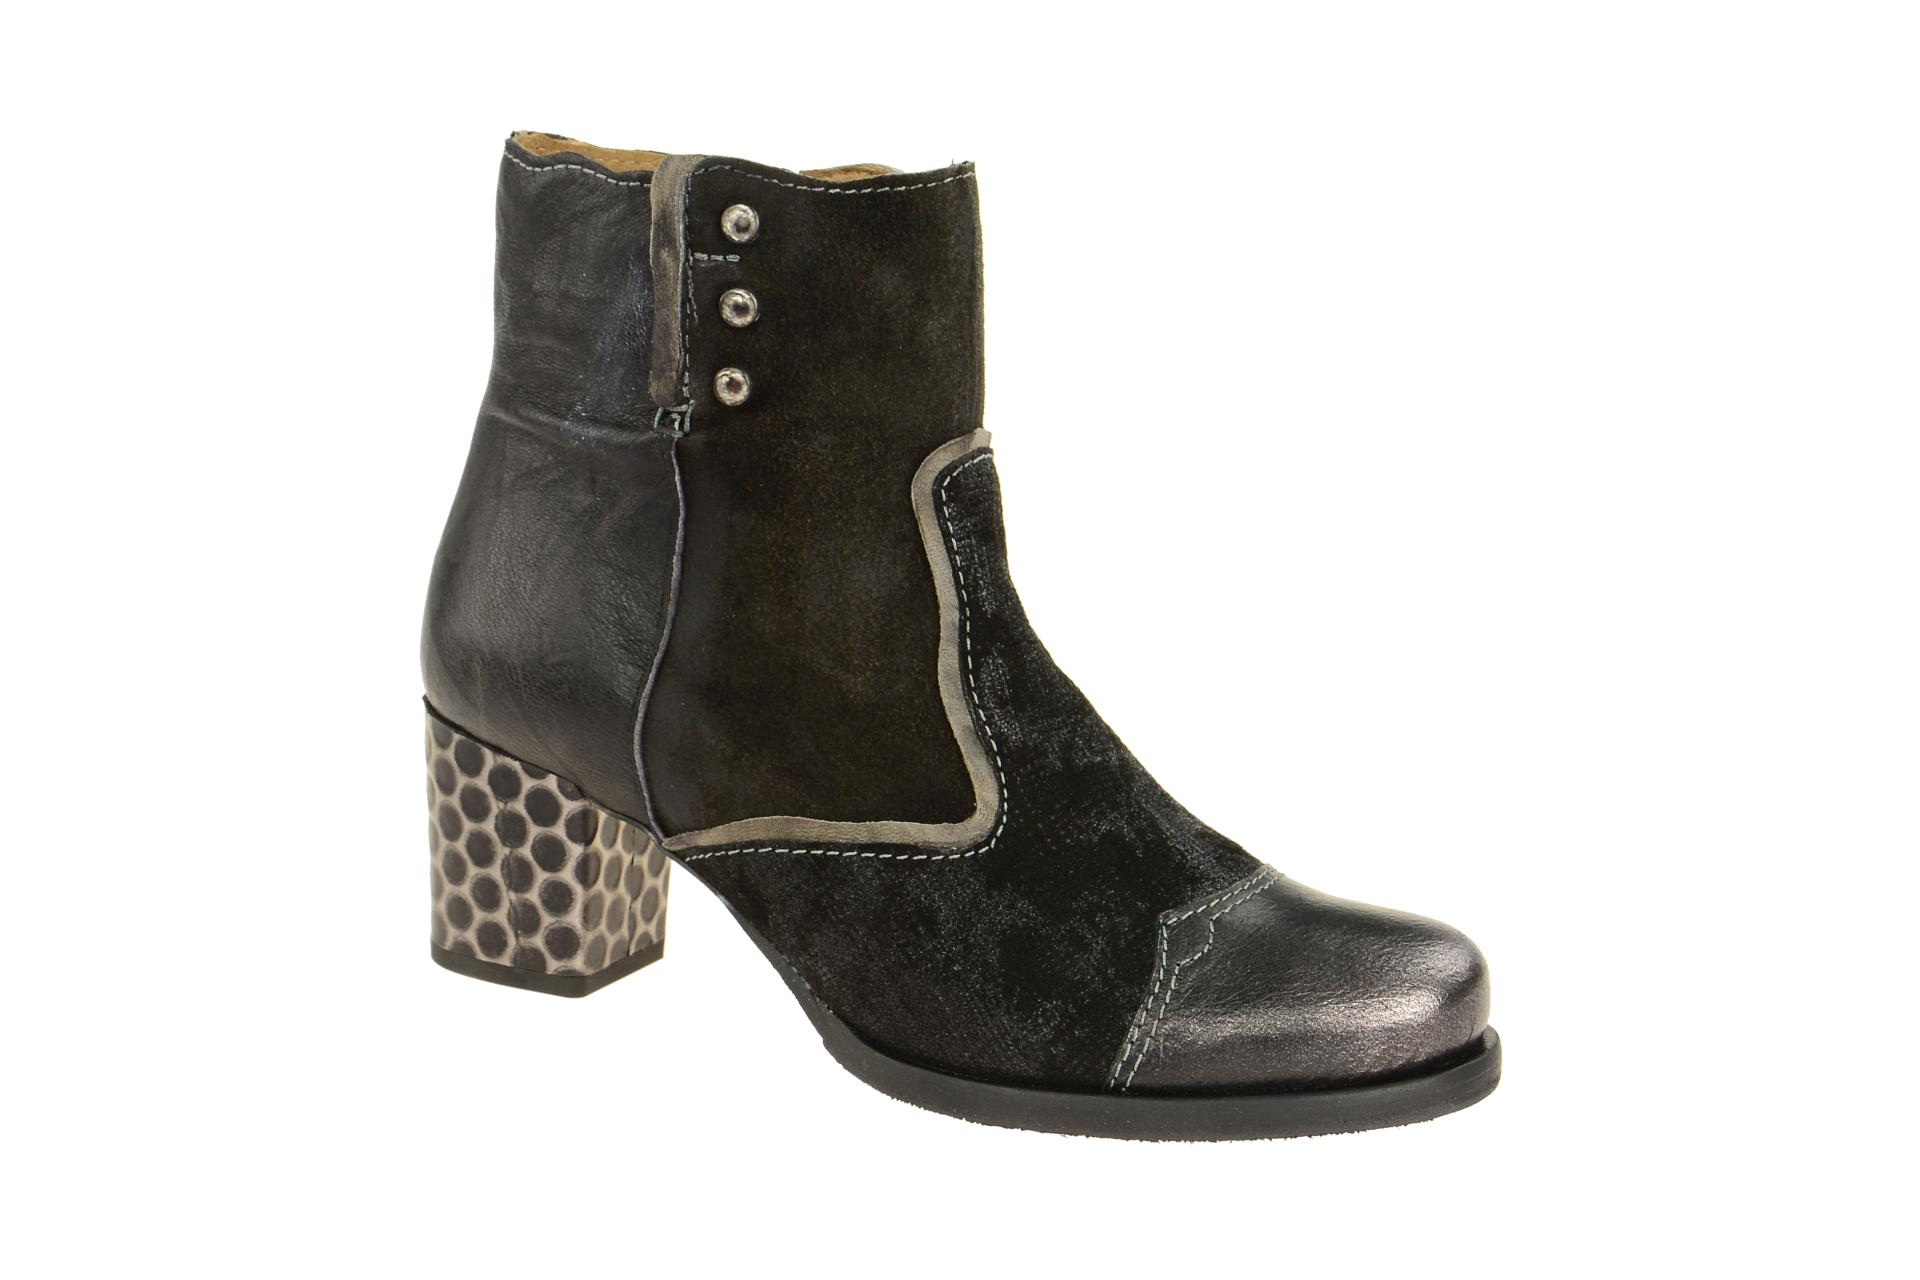 wholesale dealer c376f 9c866 Charme Stiefelette schwarz grau effekt